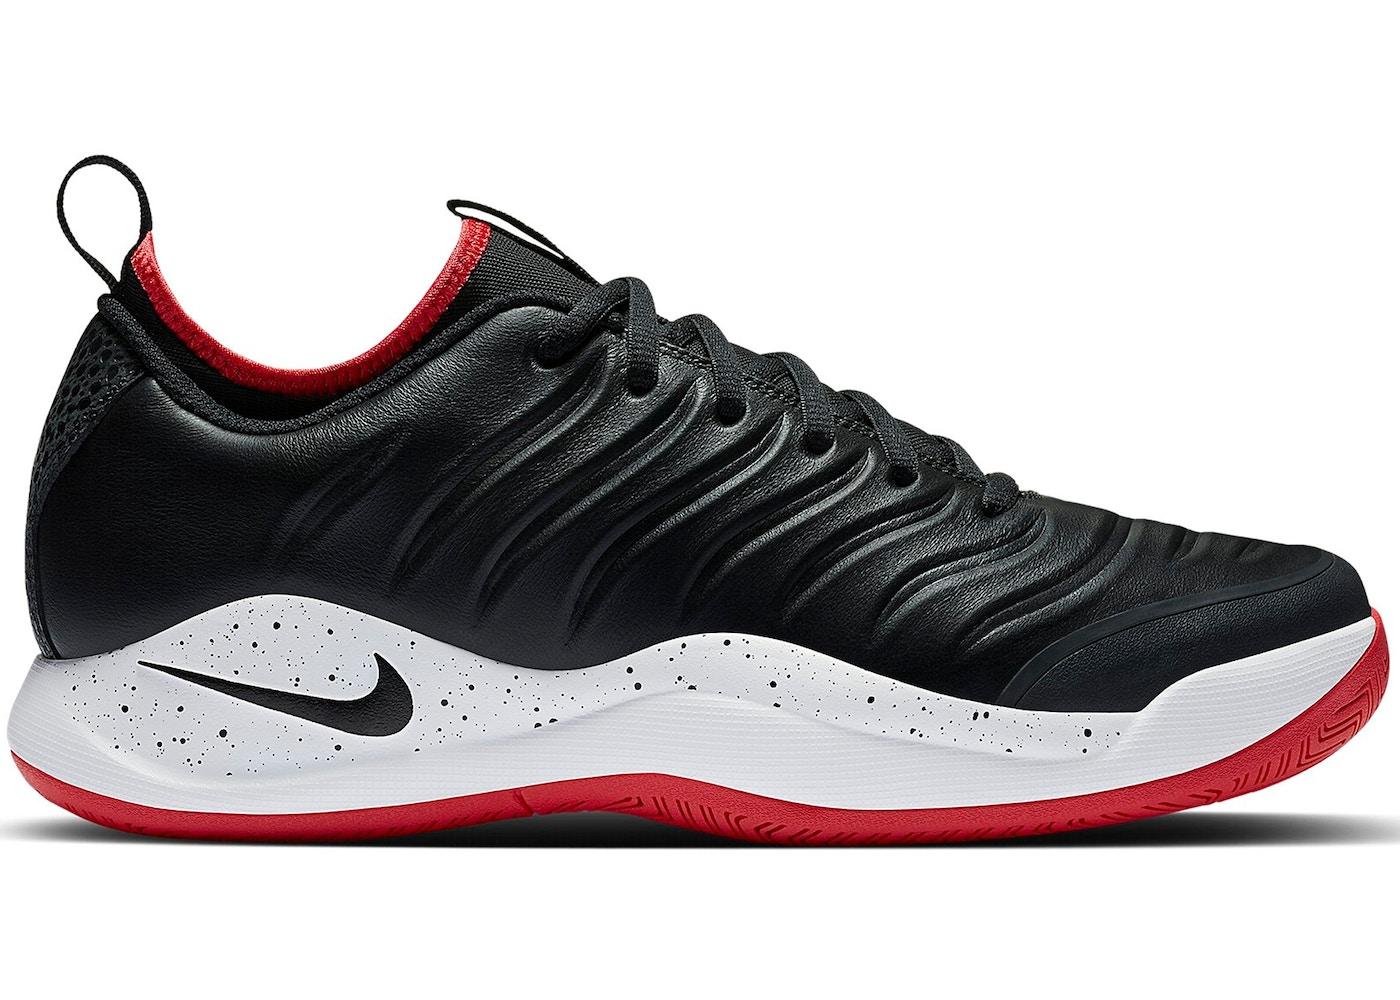 Entretener Surgir responsabilidad  Nike Air Oscillate XX Jumpsmash - AH6892-001